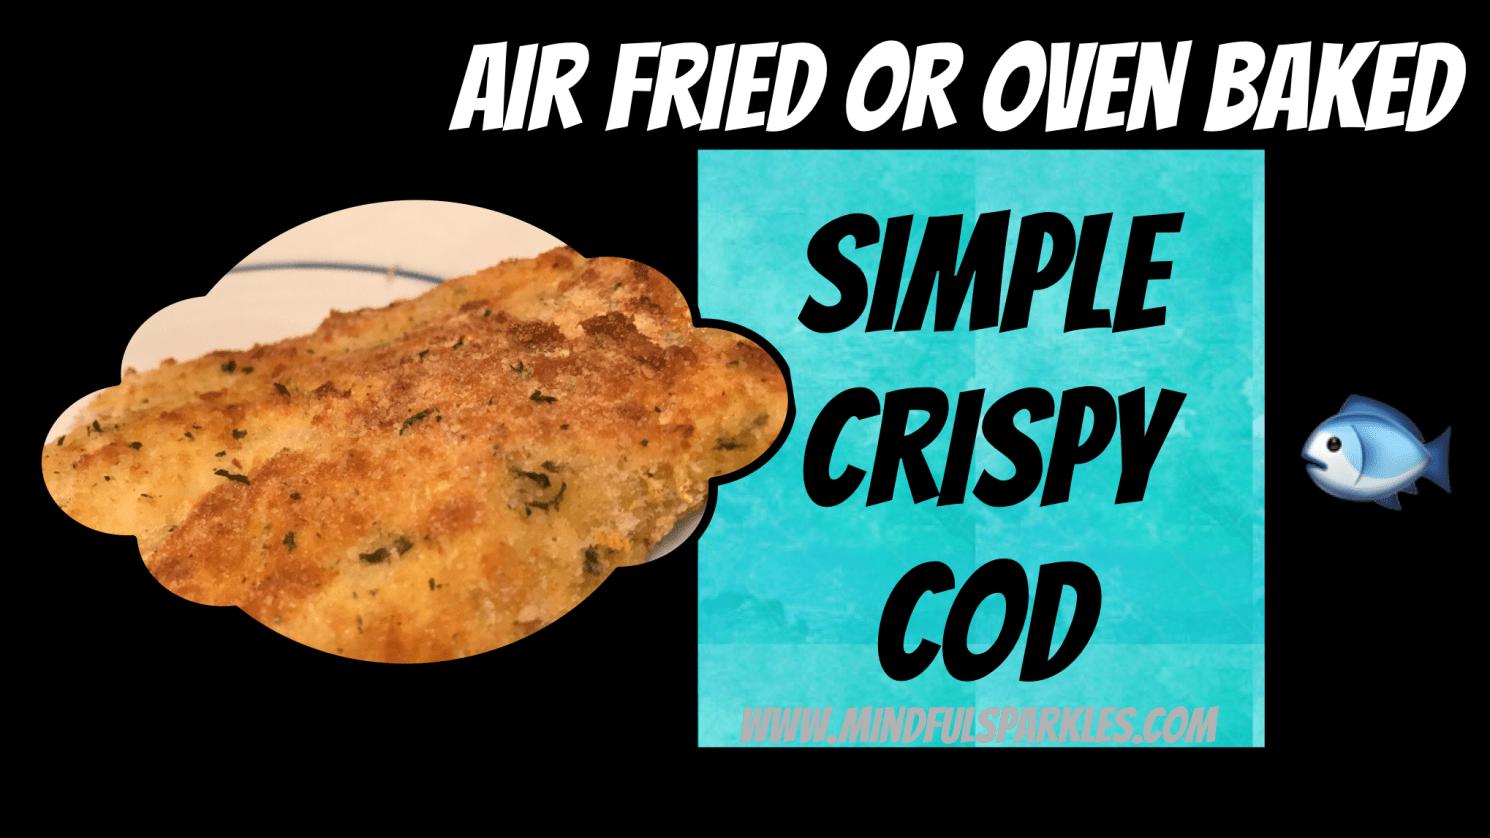 Air Fryer or Oven Baked Simple Crispy Cod Air fryer fish